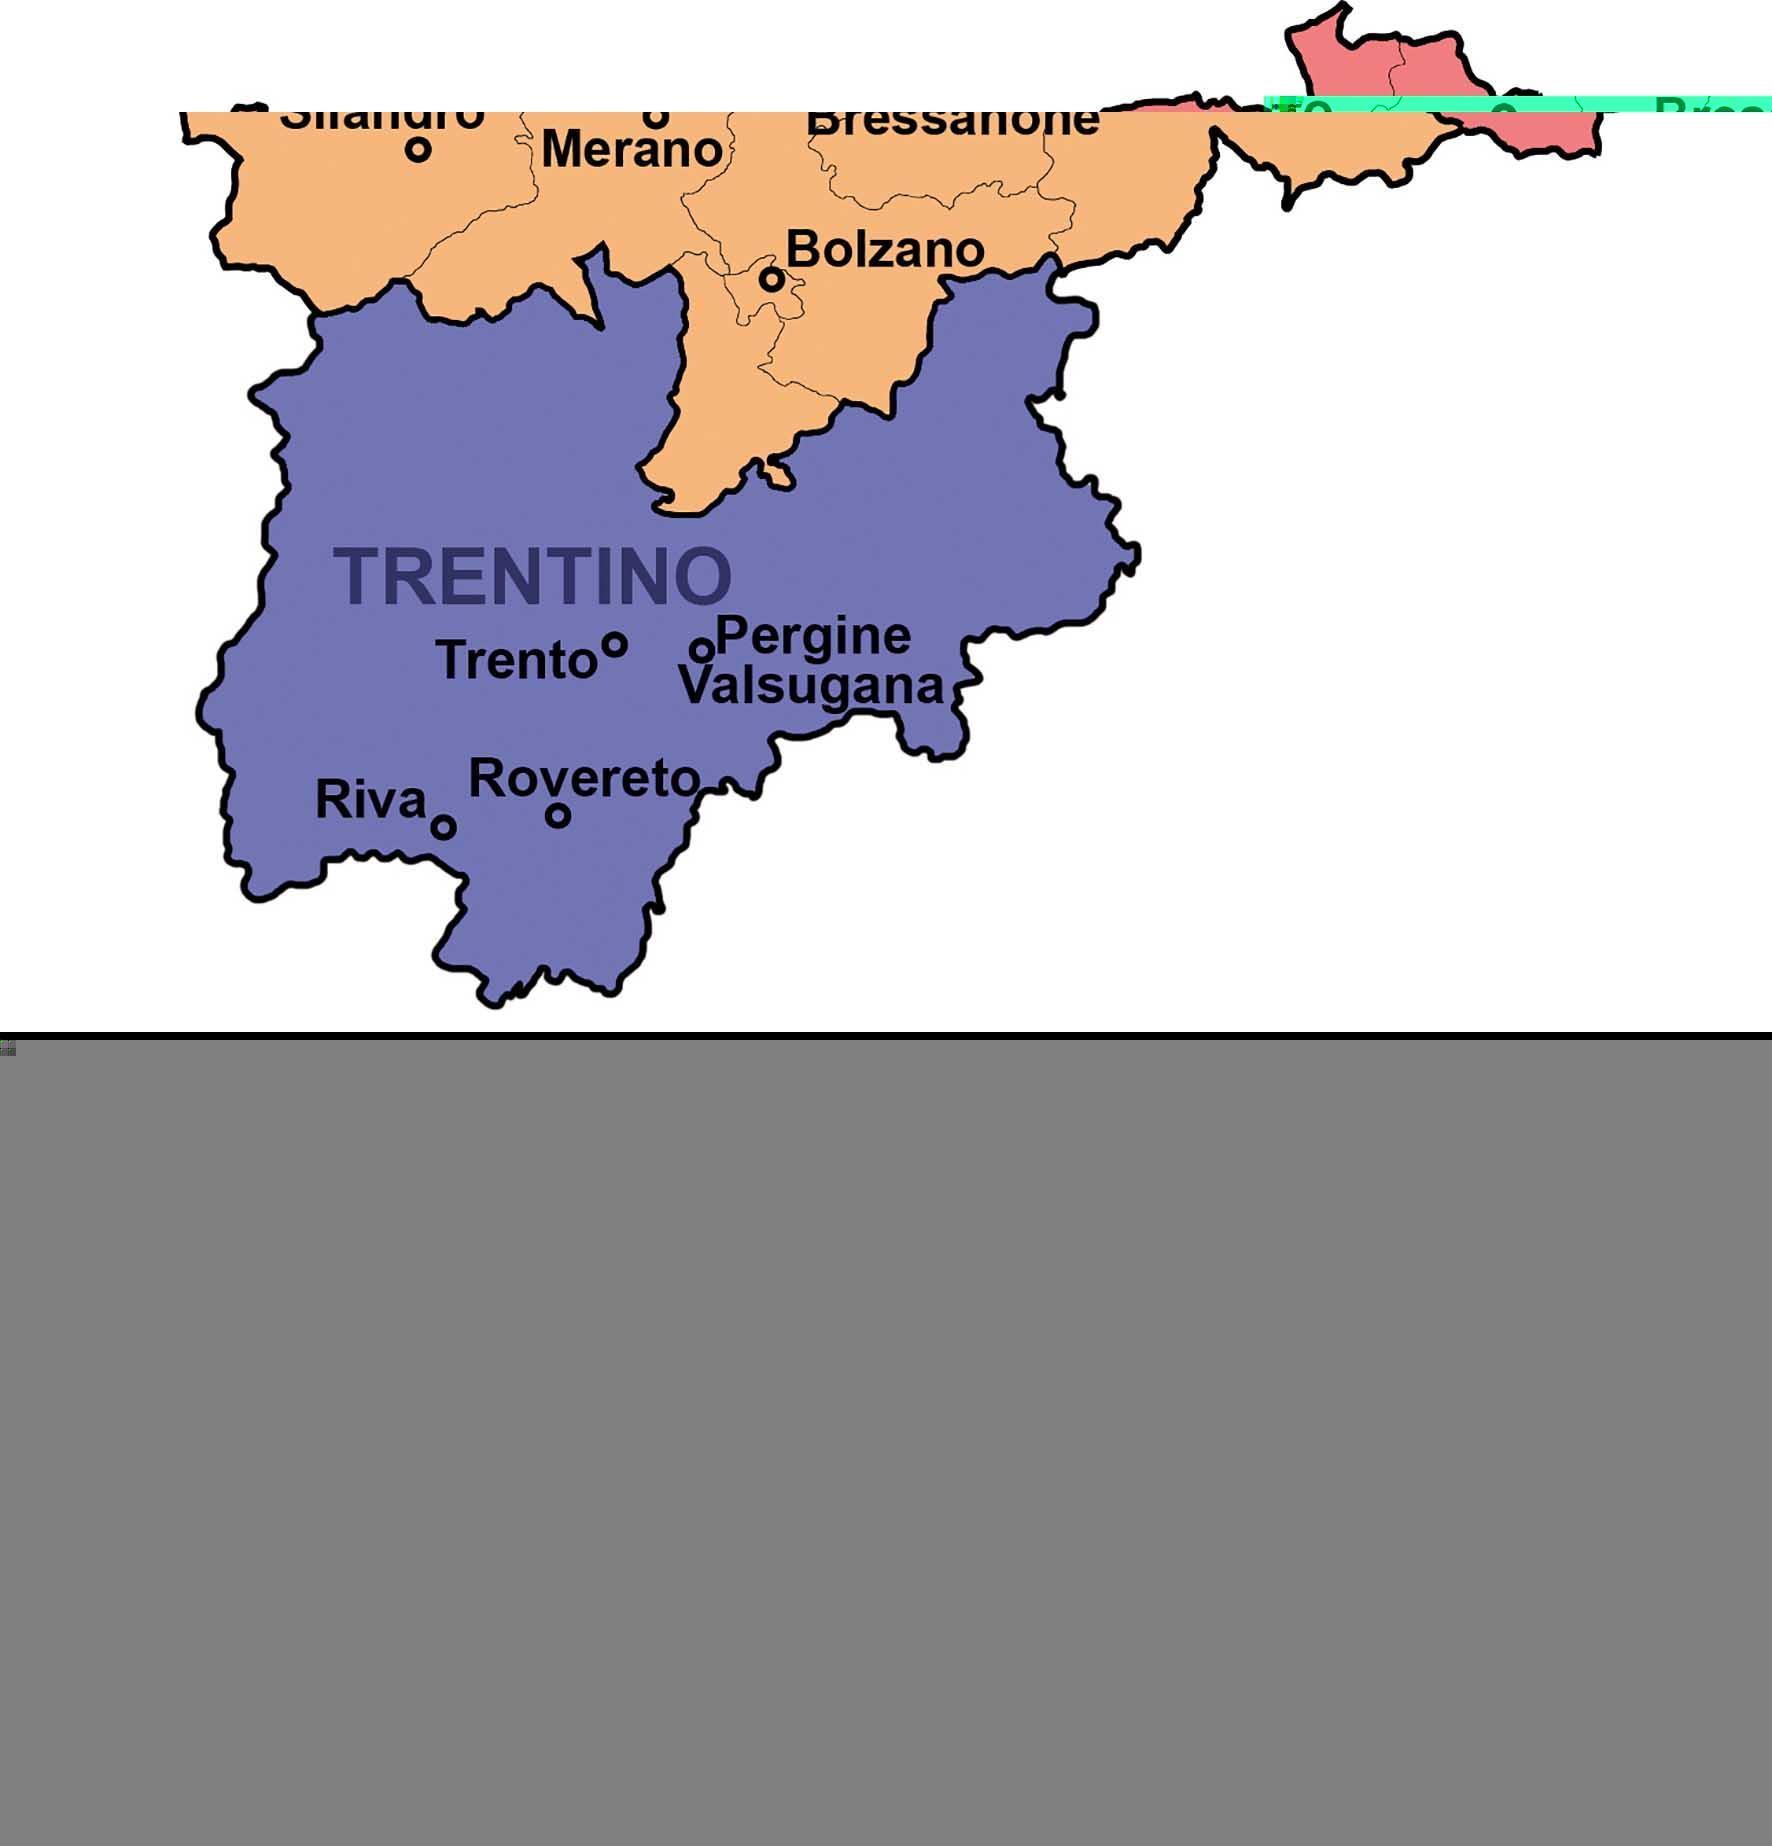 Tirolo-Südtirol-Trentino mappa con circondari